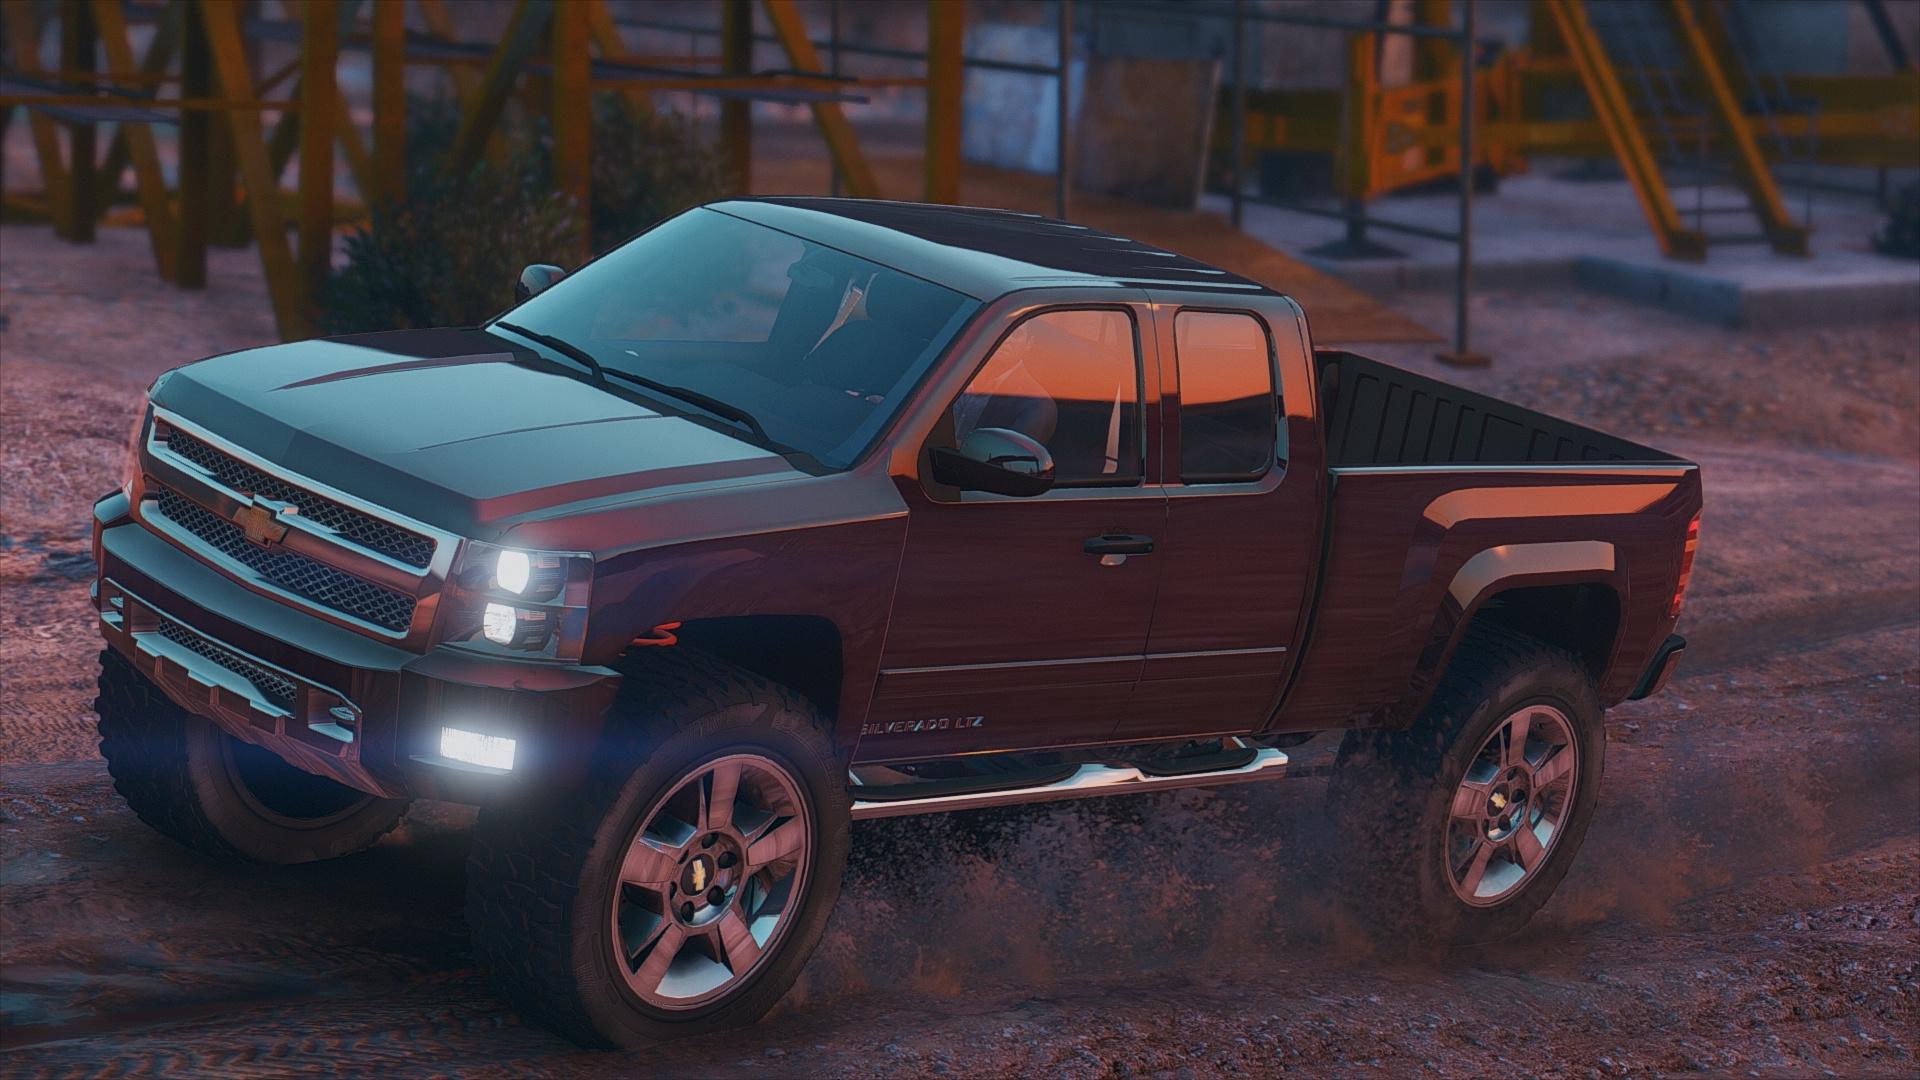 Chevrolet Silverado 1500 Ltz Add On Tuning Gta5 Mods Com